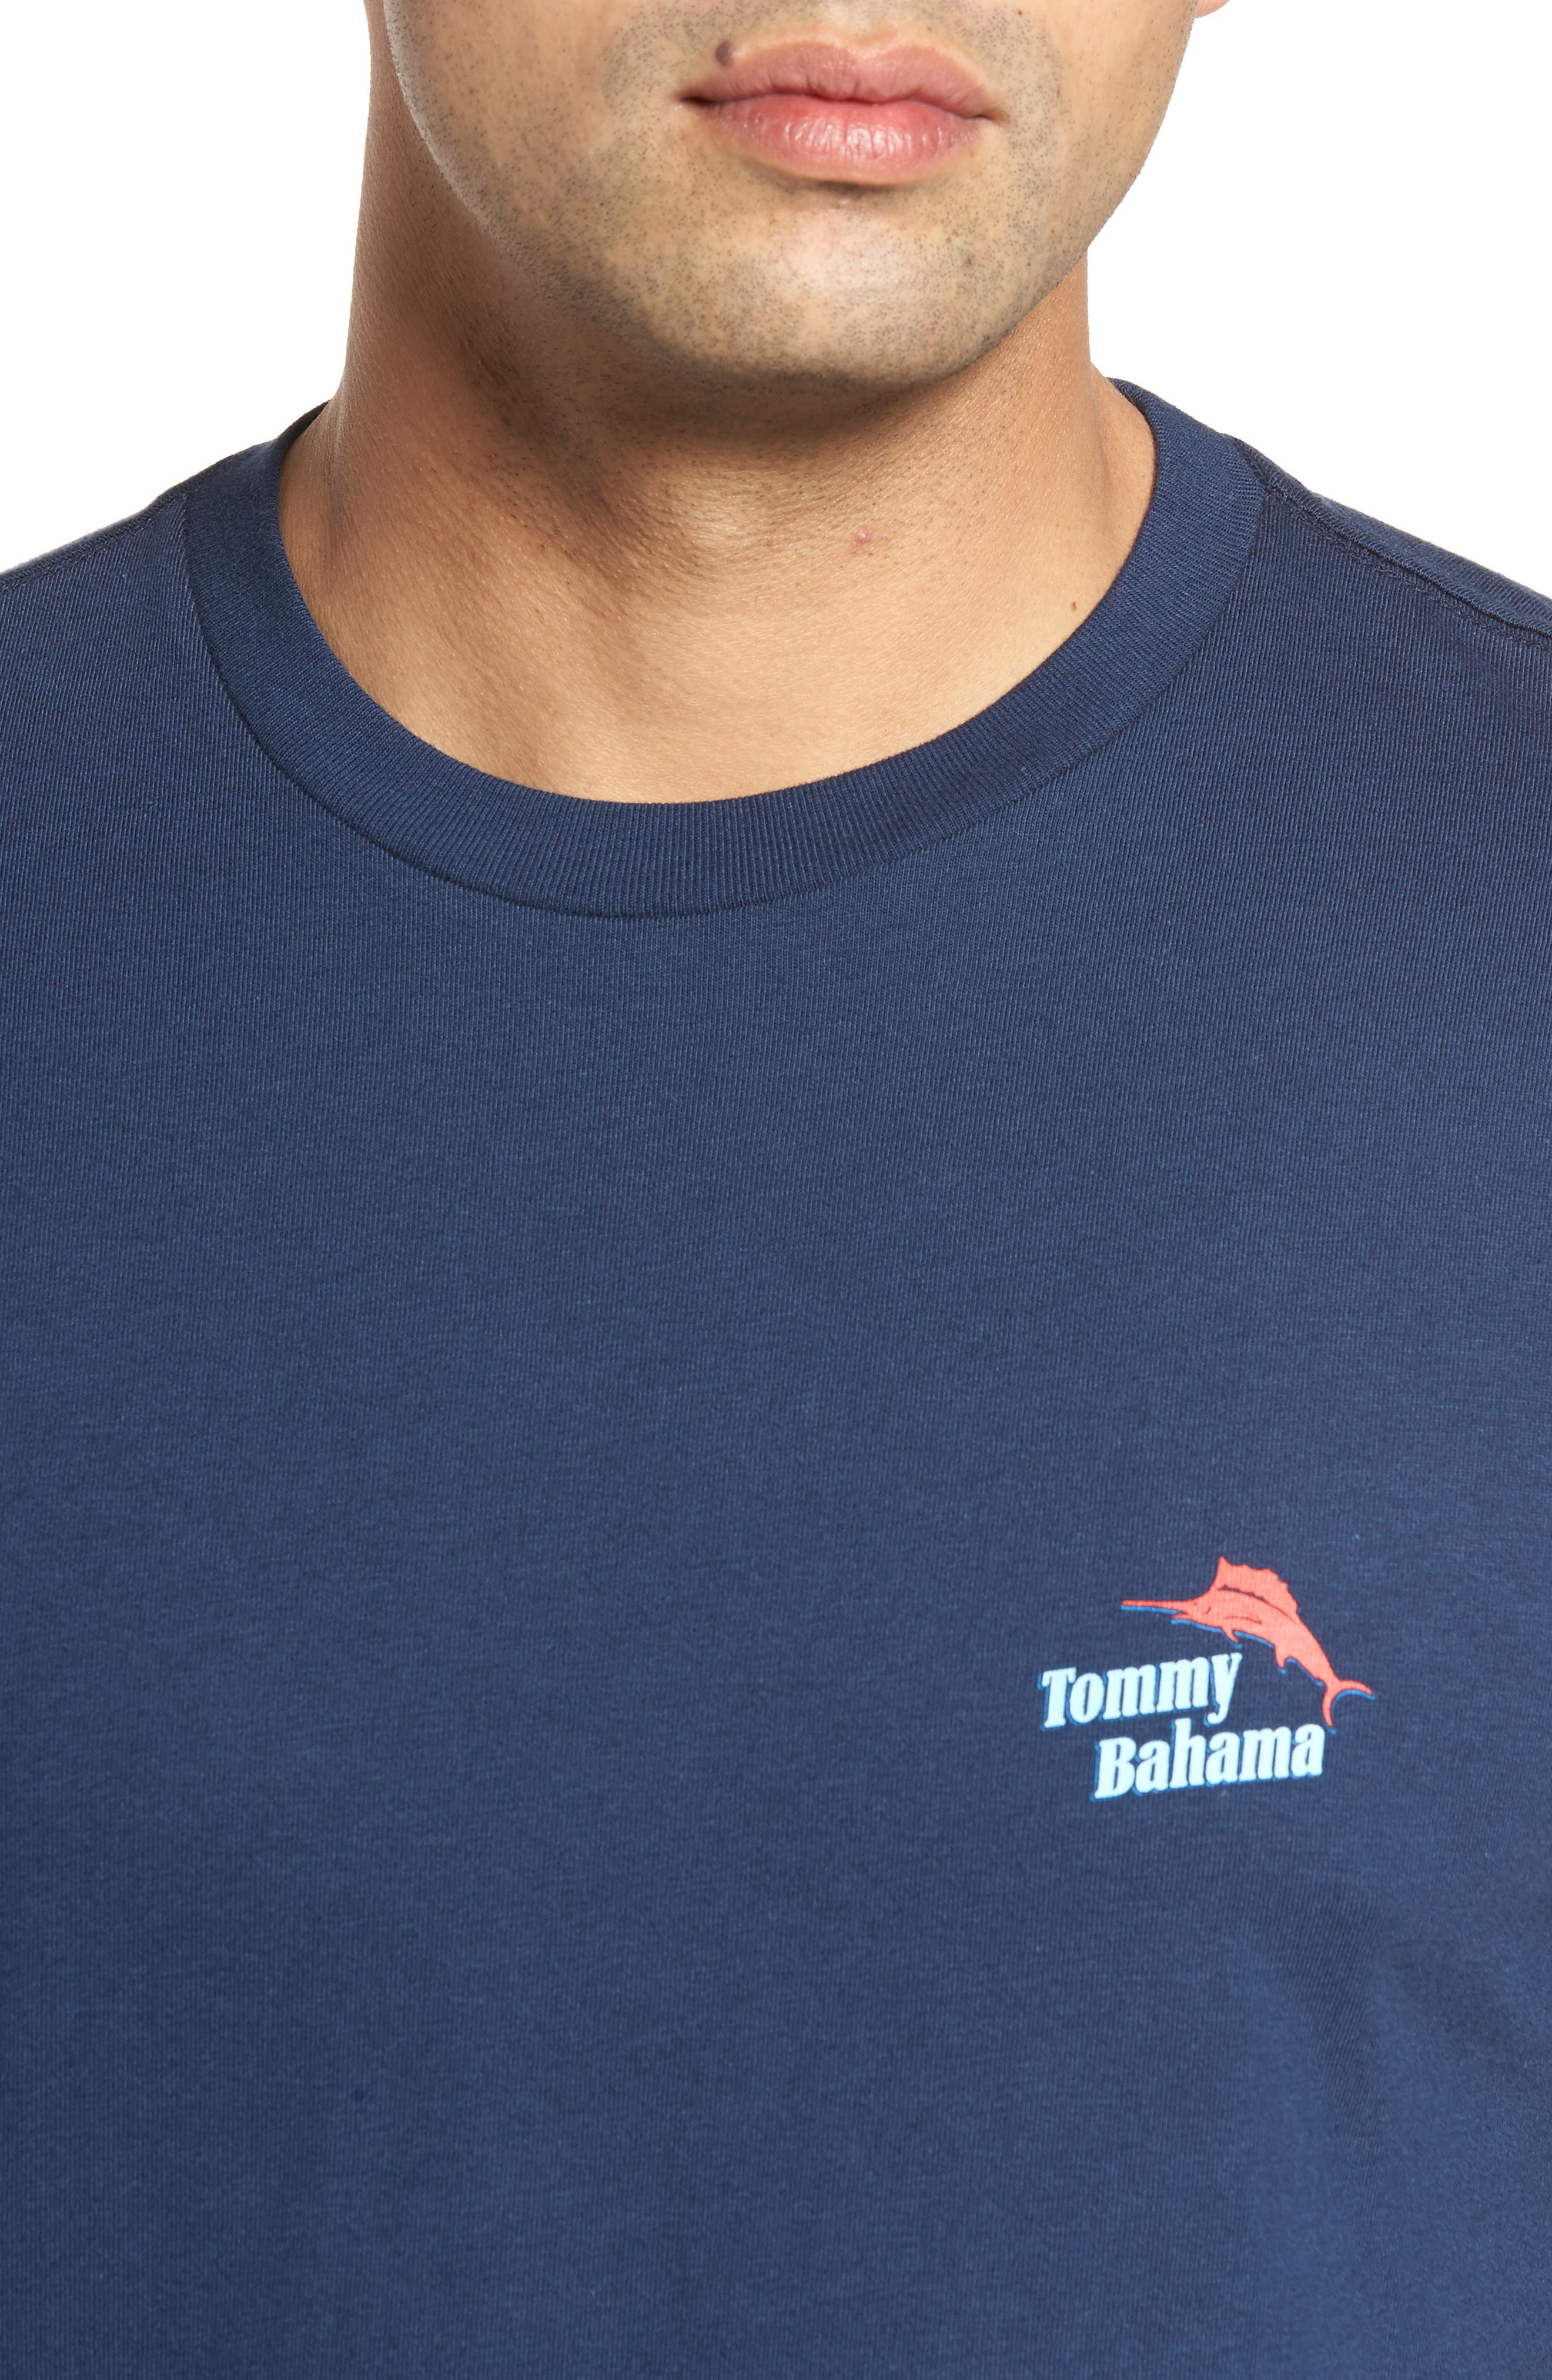 Parrot Sailing T-Shirt,                             Alternate thumbnail 4, color,                             Navy